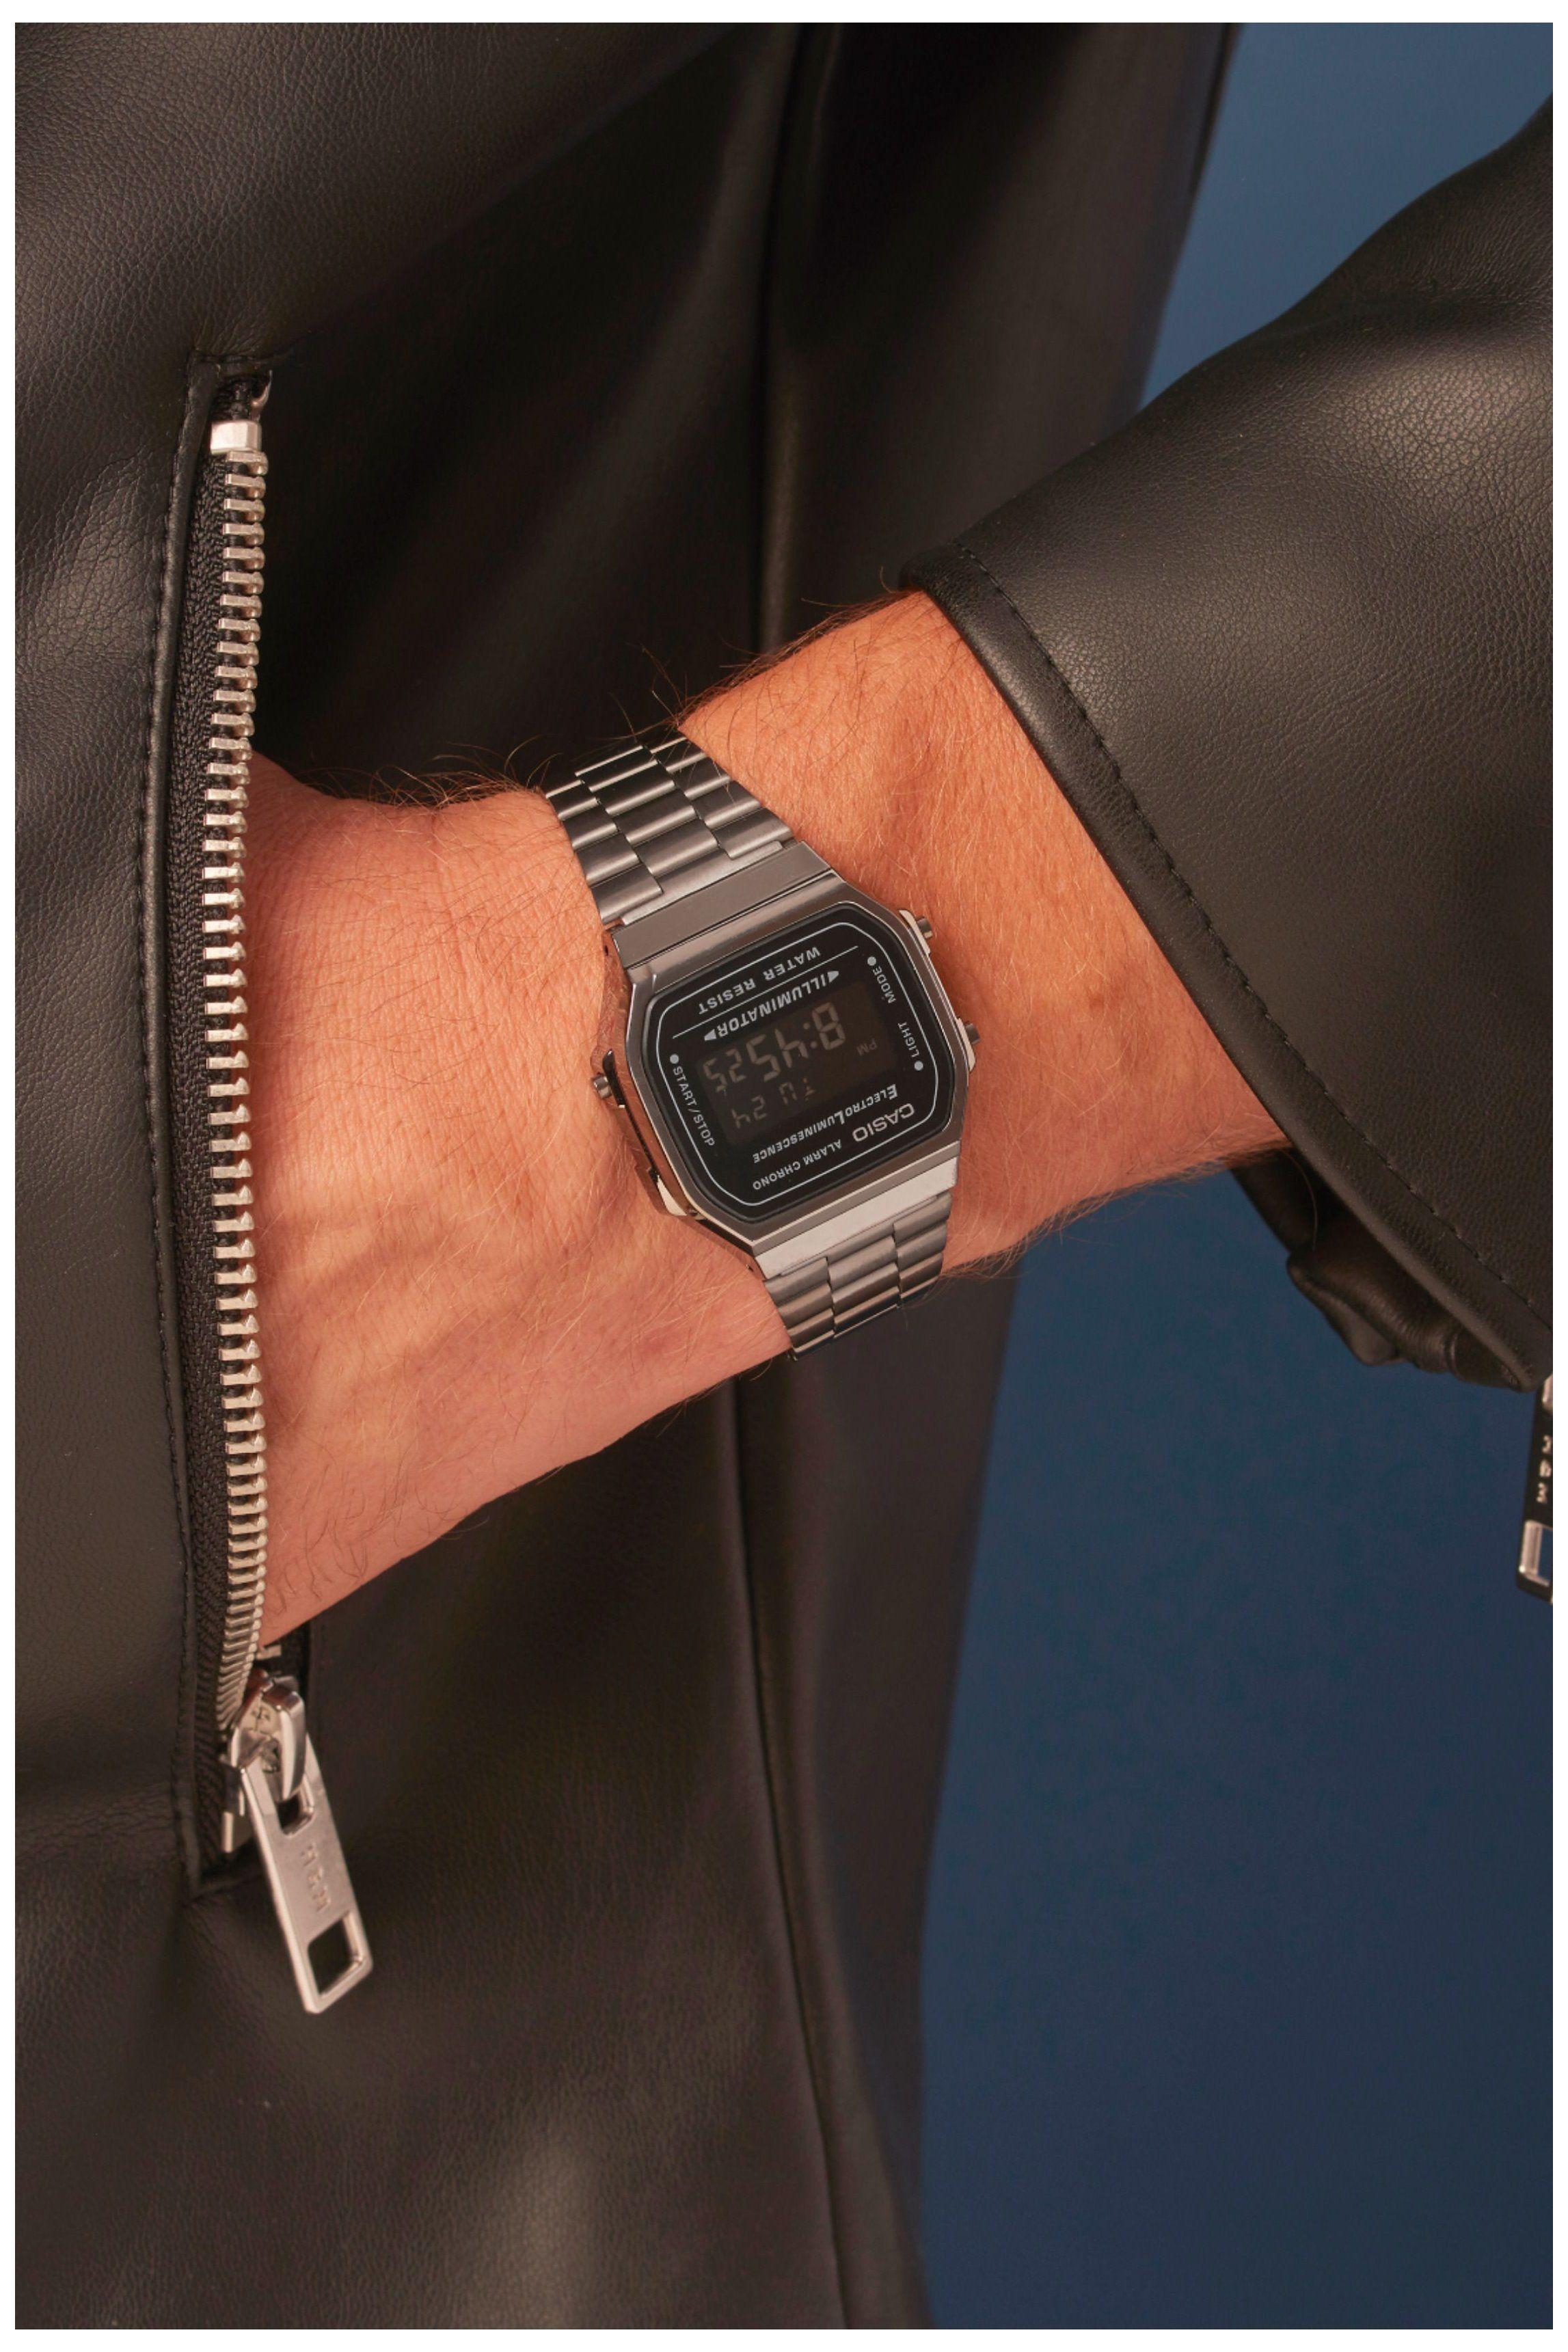 Casio Vintage A168wegg 1bef Casio Watch Retro Men Relógios Elegantes Relogios Acessórios